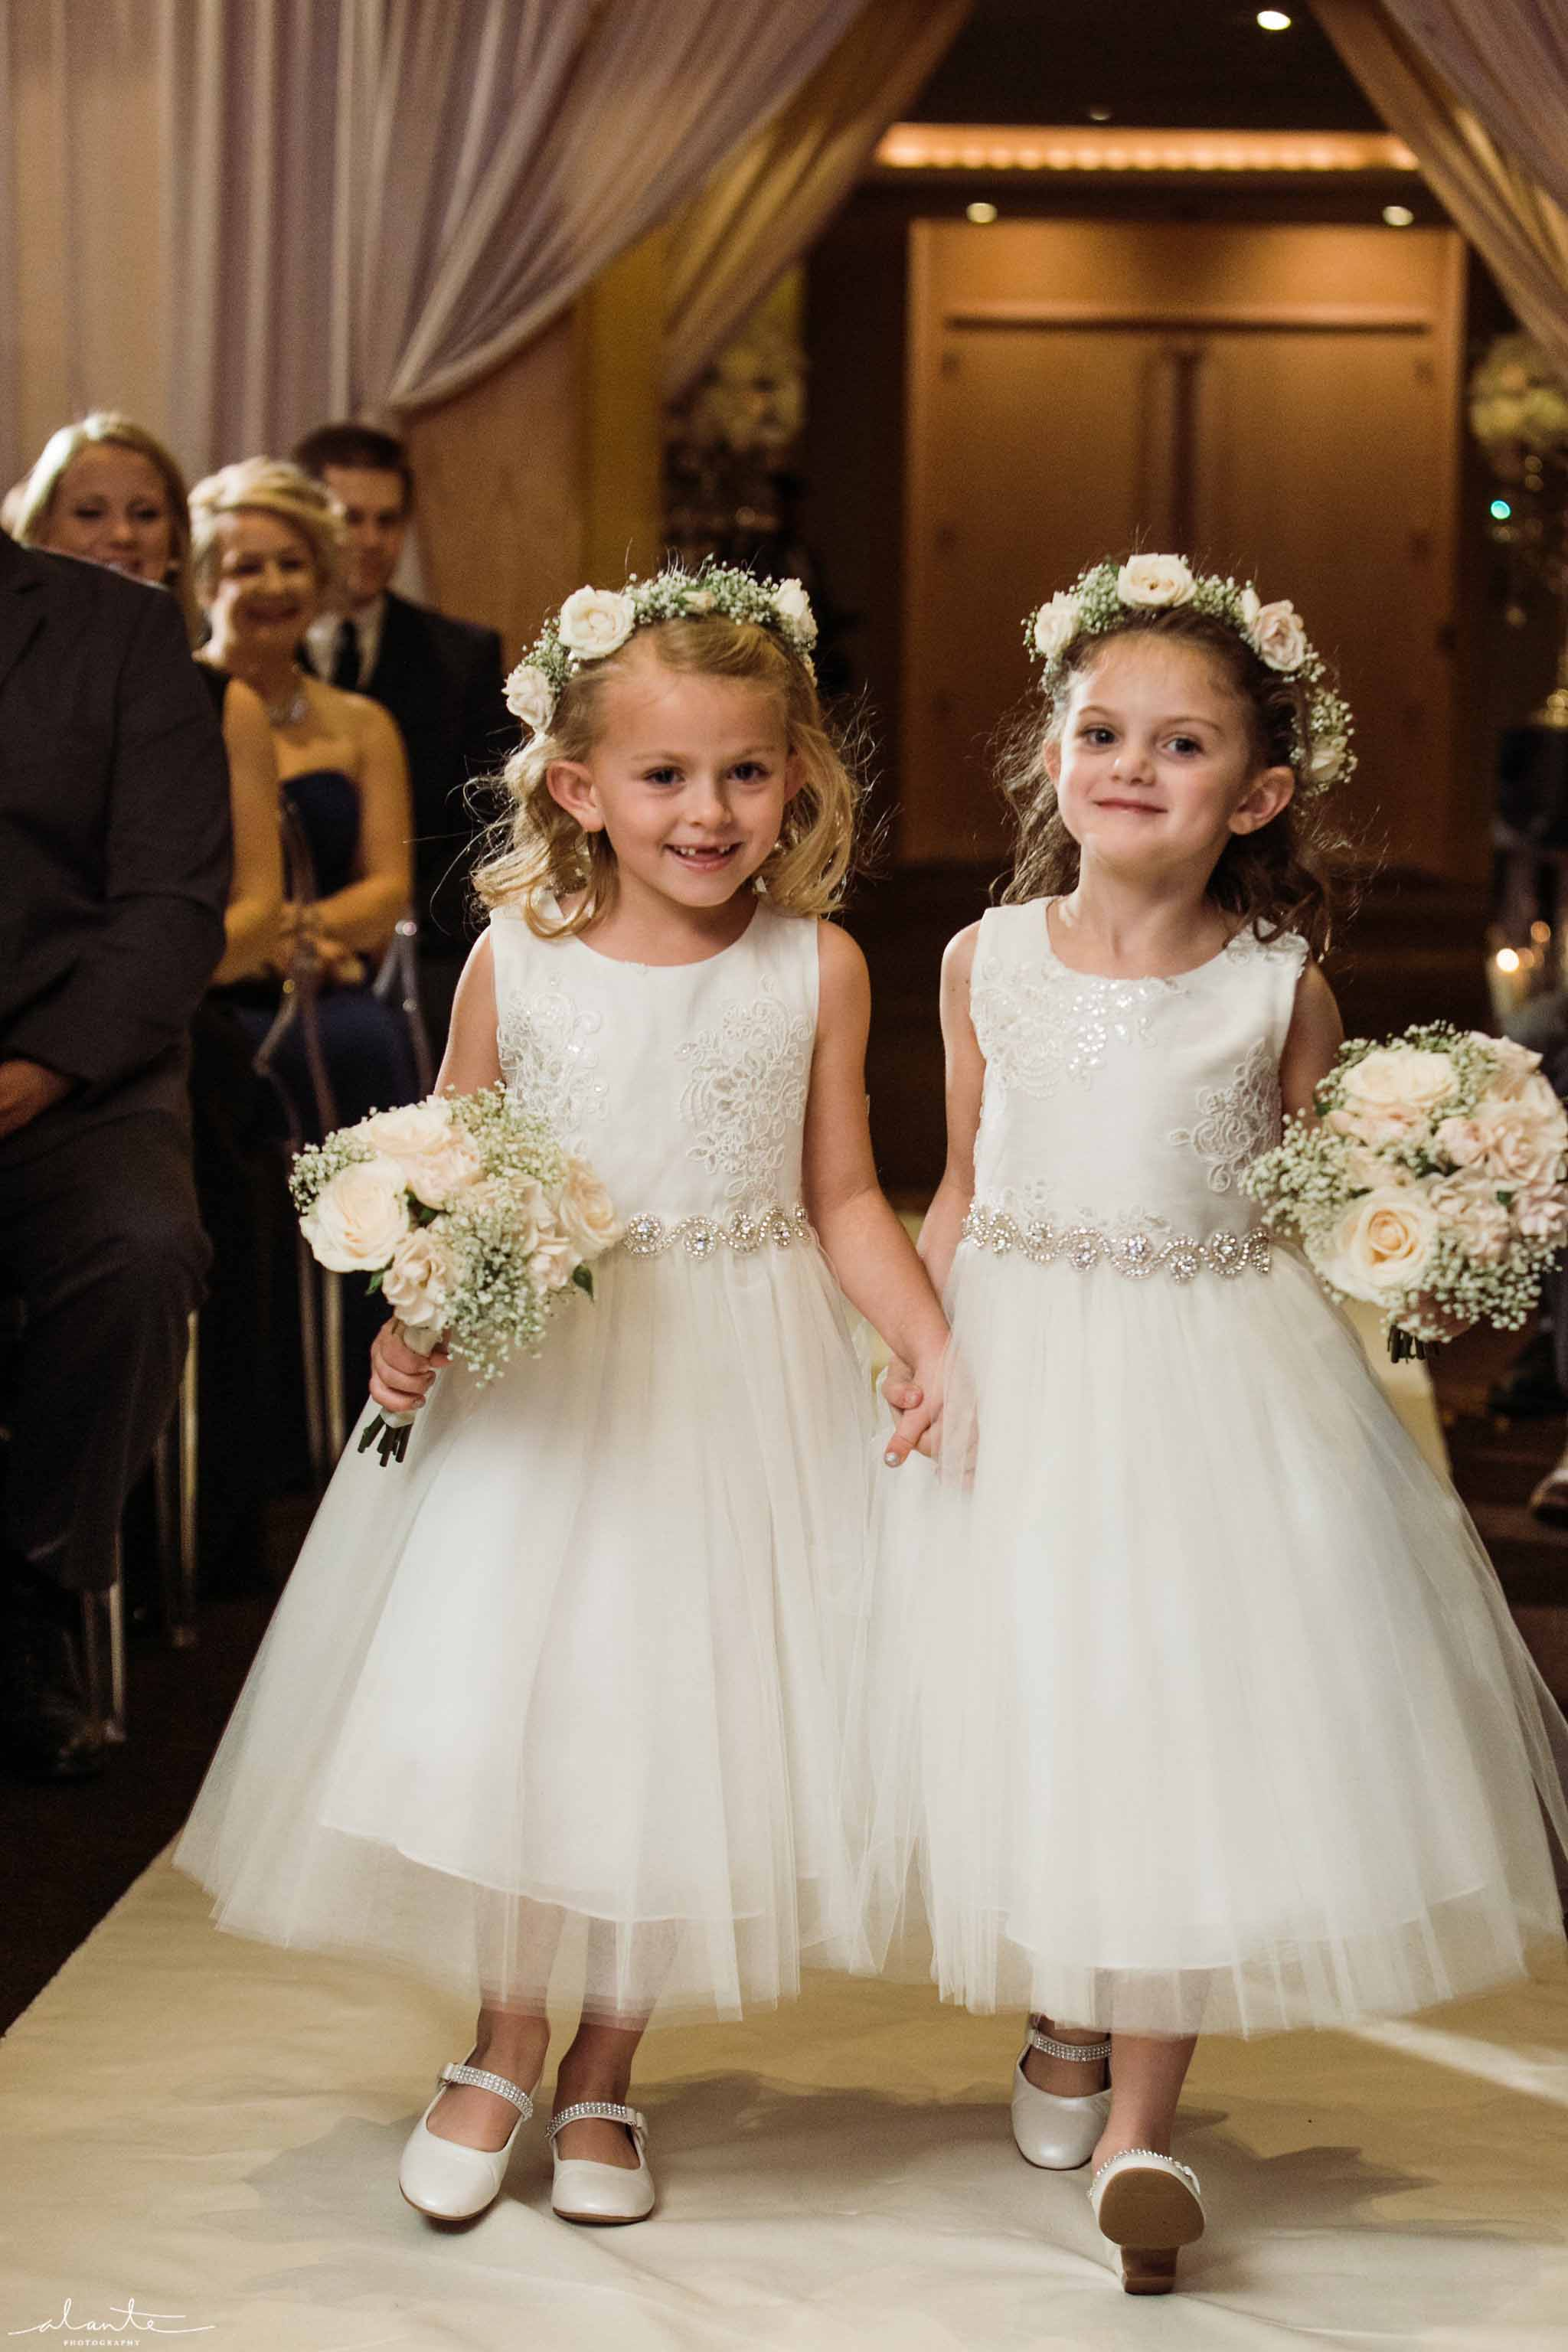 Wedding flower girls in all white - Luxury Winter Wedding at the Four Seasons by Flora Nova Design Seattle